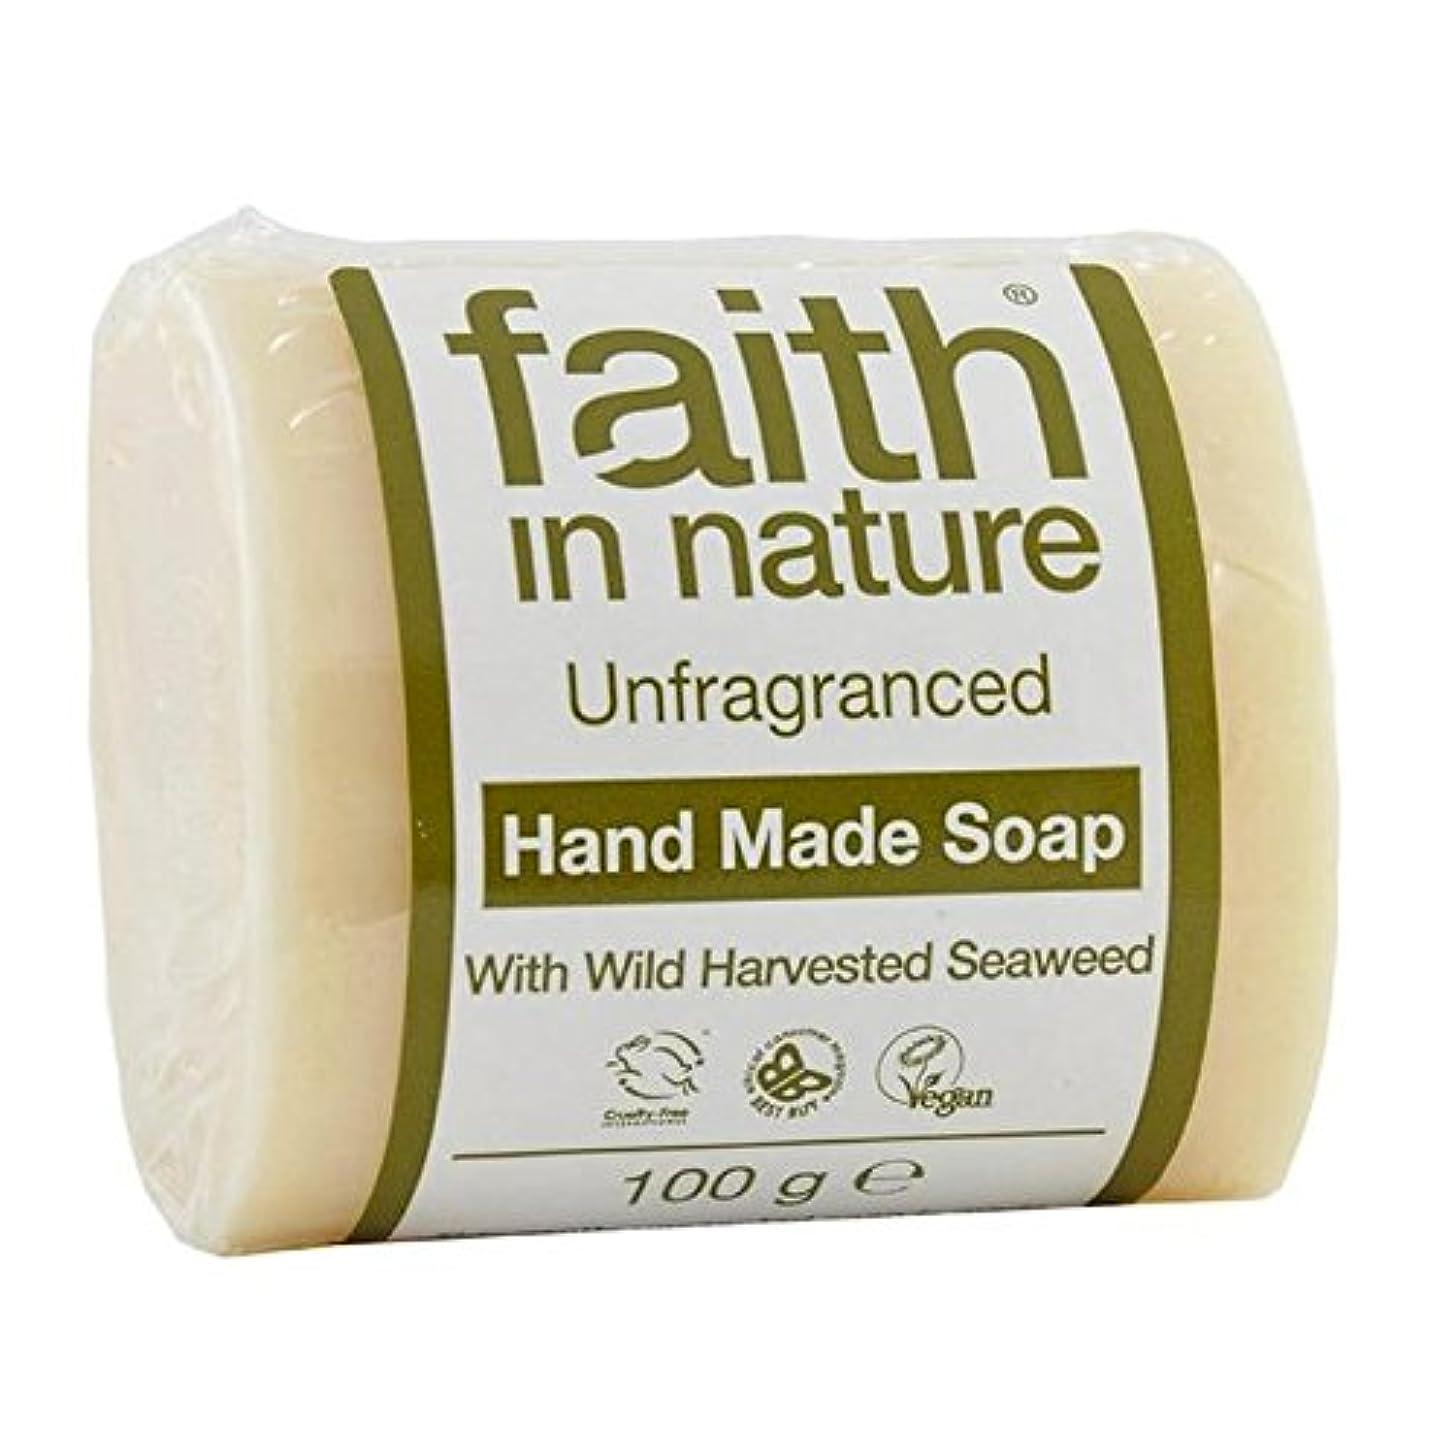 Faith in Nature Unfragranced Pure Hand Made Soap 100g - (Faith In Nature) 自然の中で信仰は純粋な手作り石鹸100グラムを無香料 [並行輸入品]